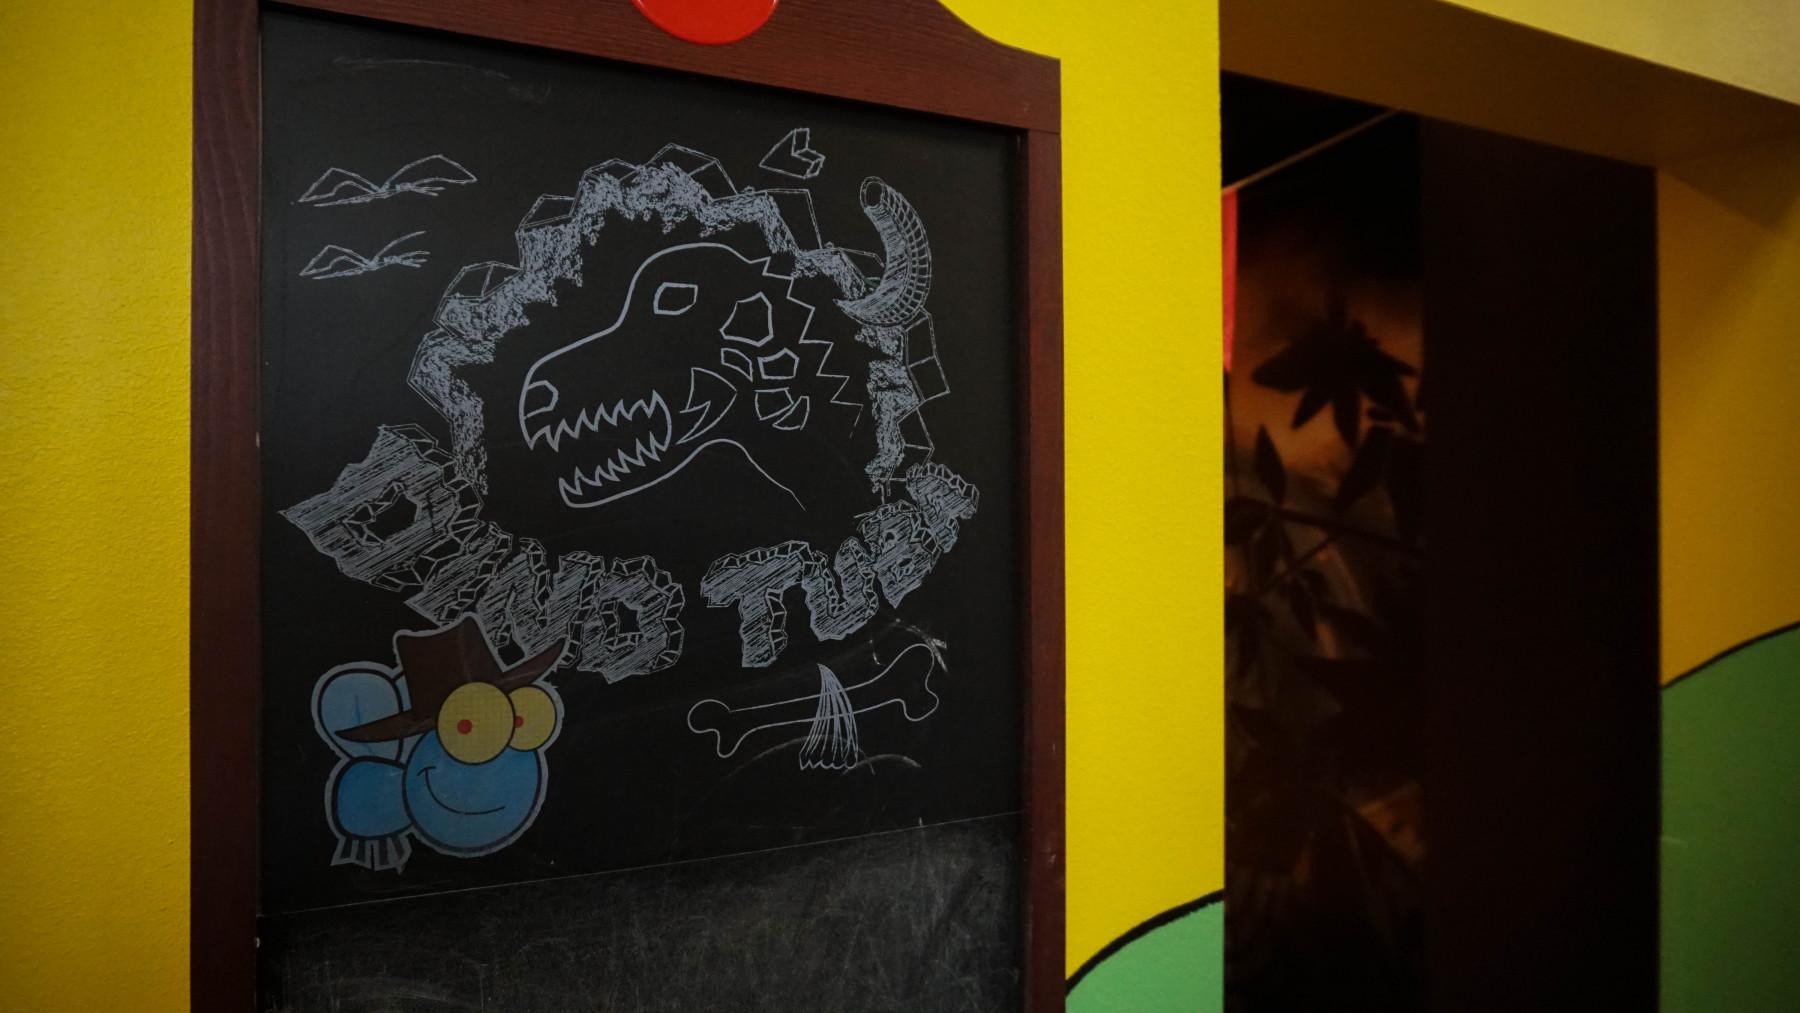 Dino tuba / 20 käepaela / Asub esimesel korrusel